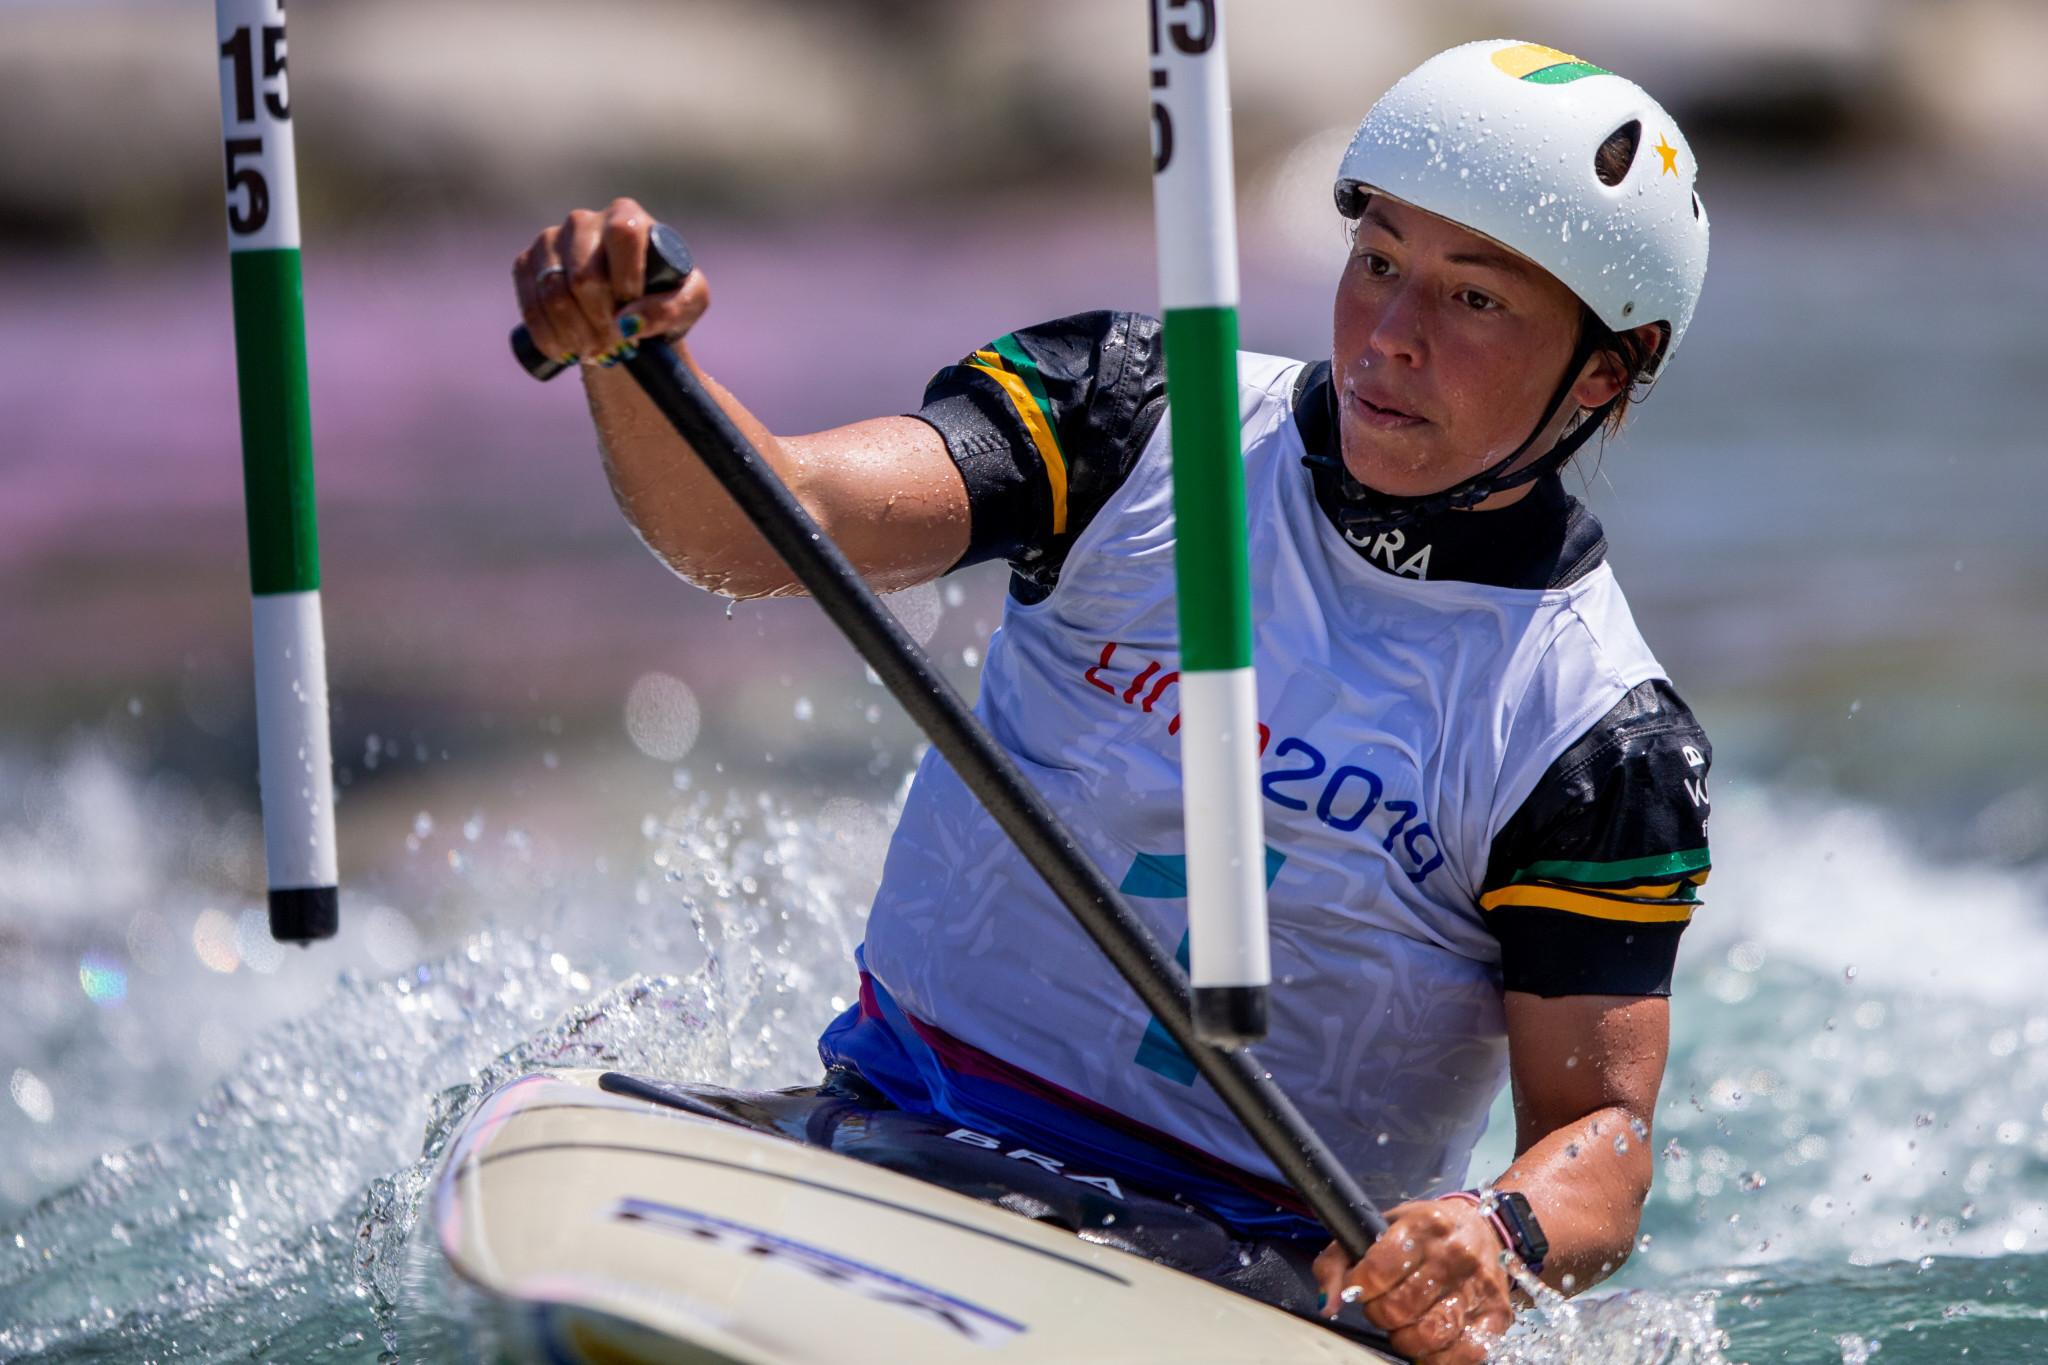 Brazilian Ana Satila acheived two canoe slalom gold medals ©Lima 2019